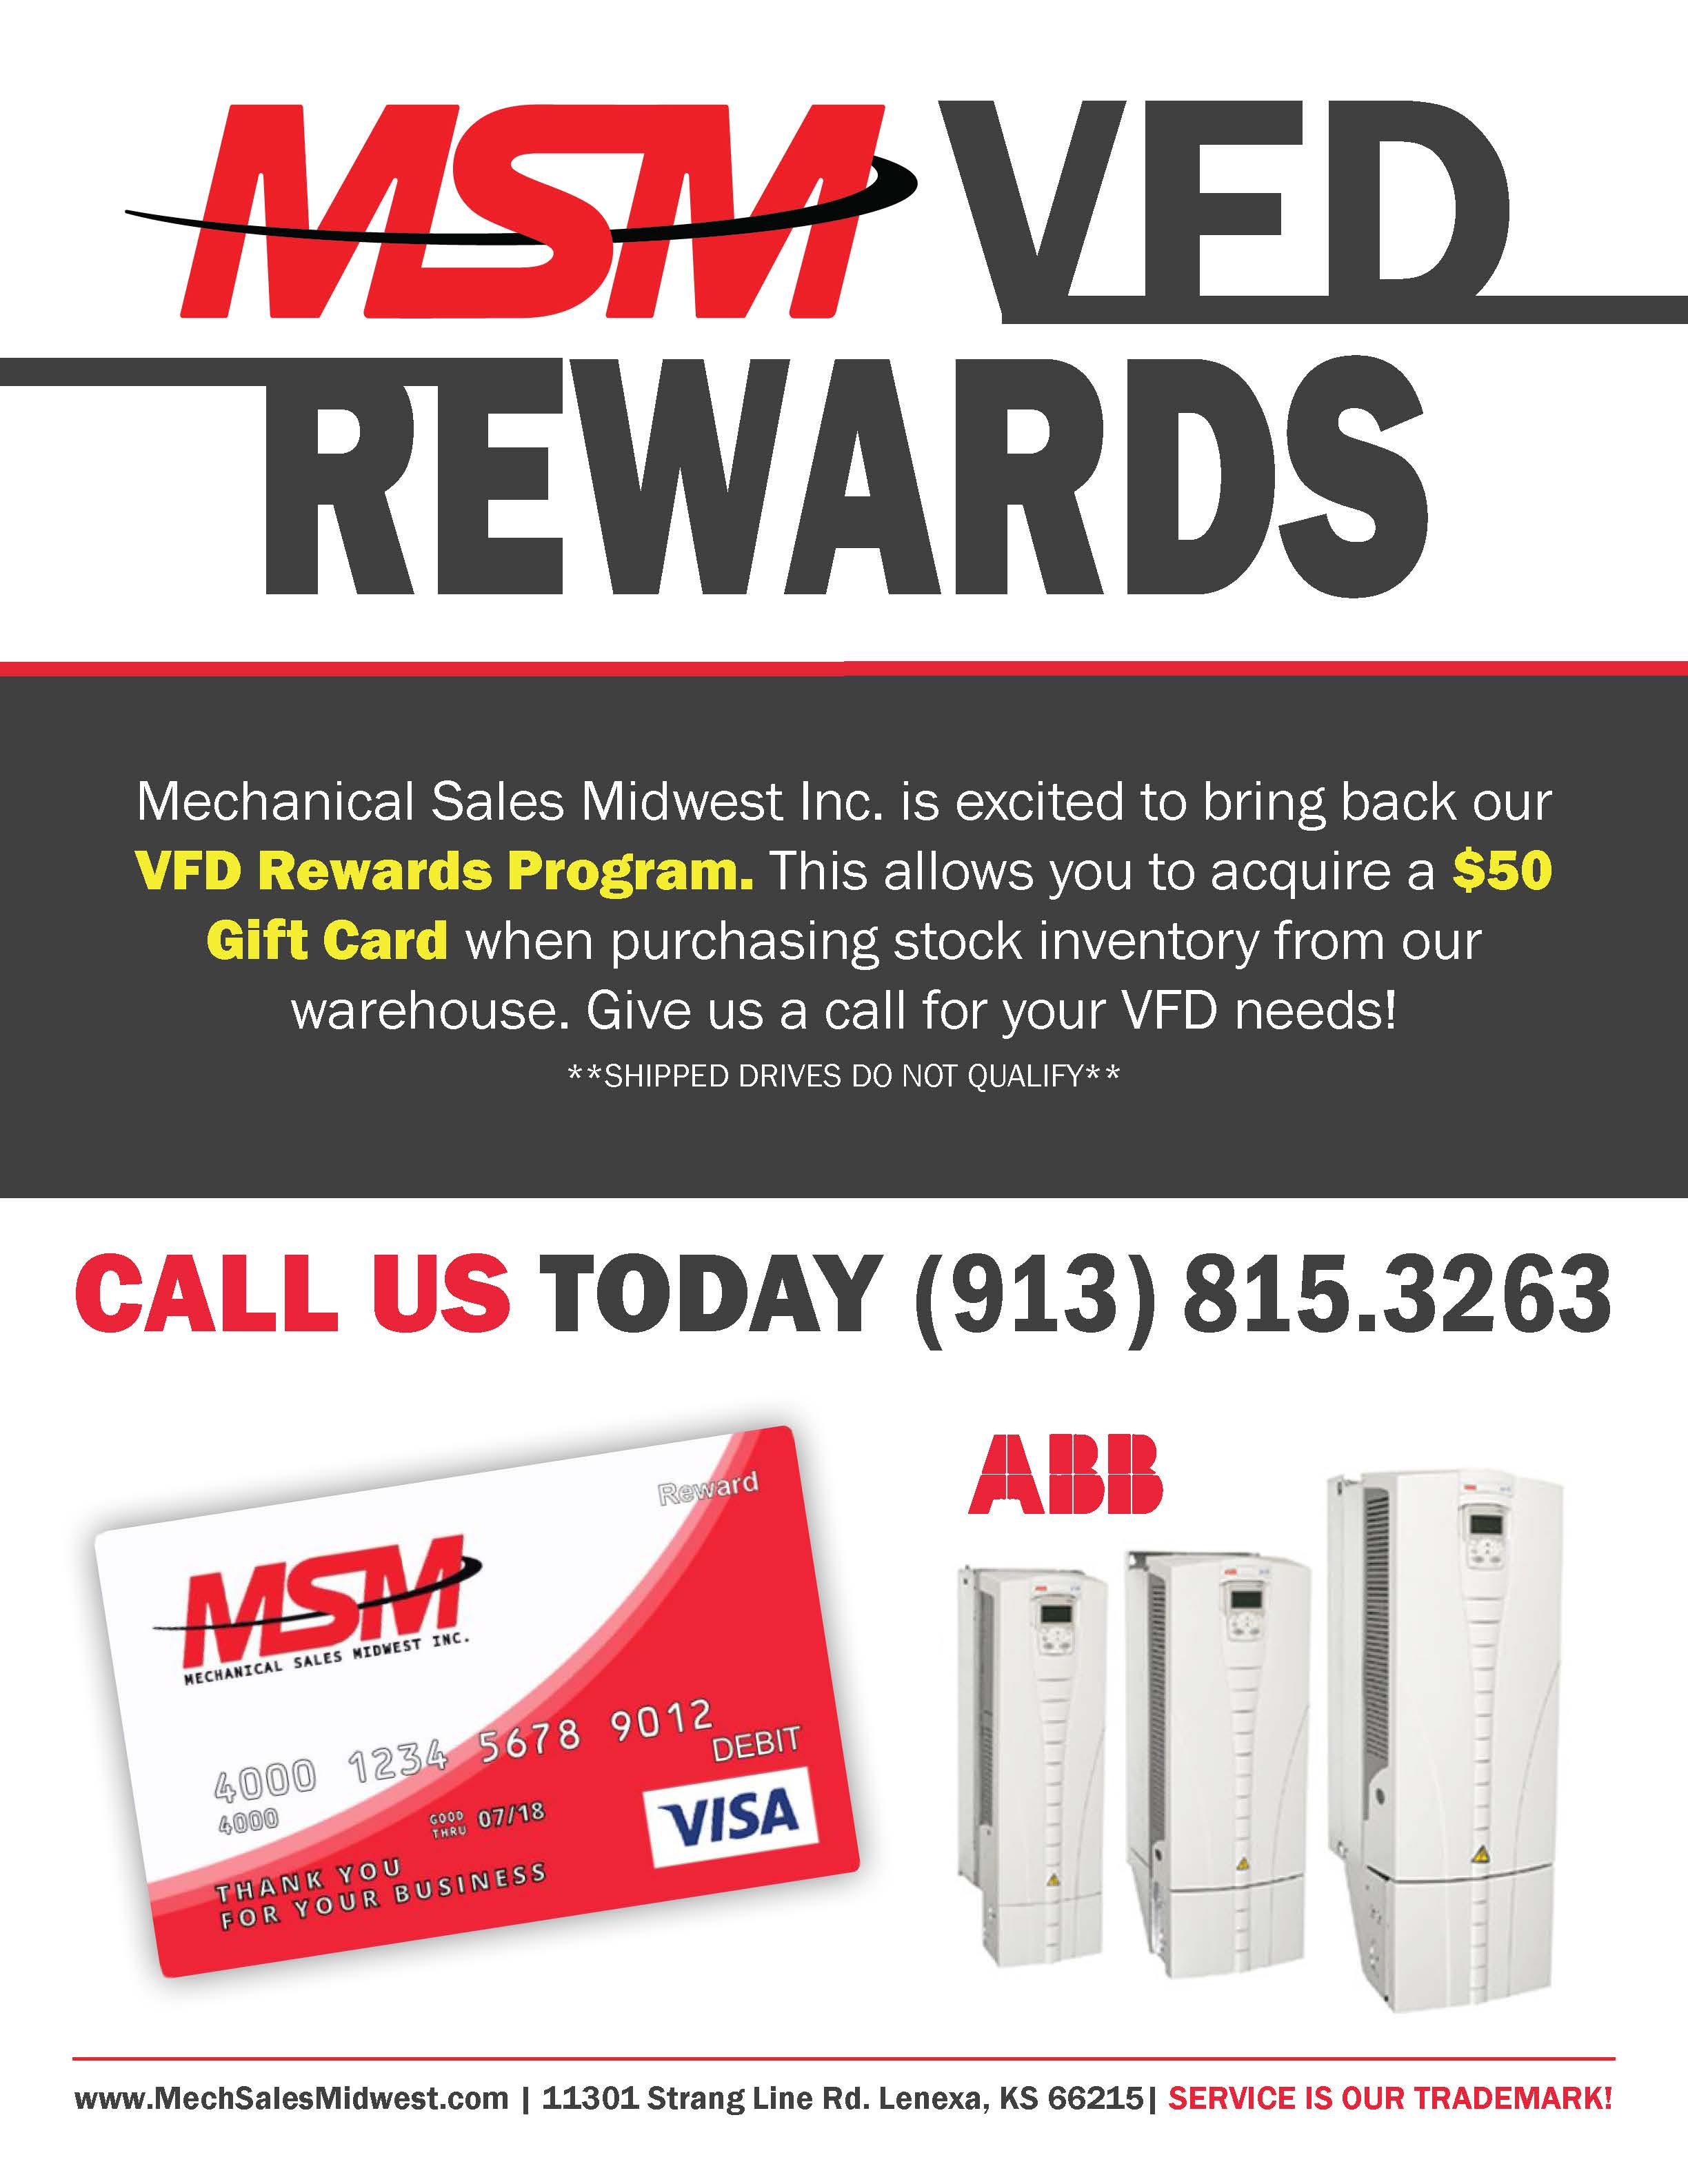 Need a VFD FAST? | Take Advantage of our VFD Rewards Program